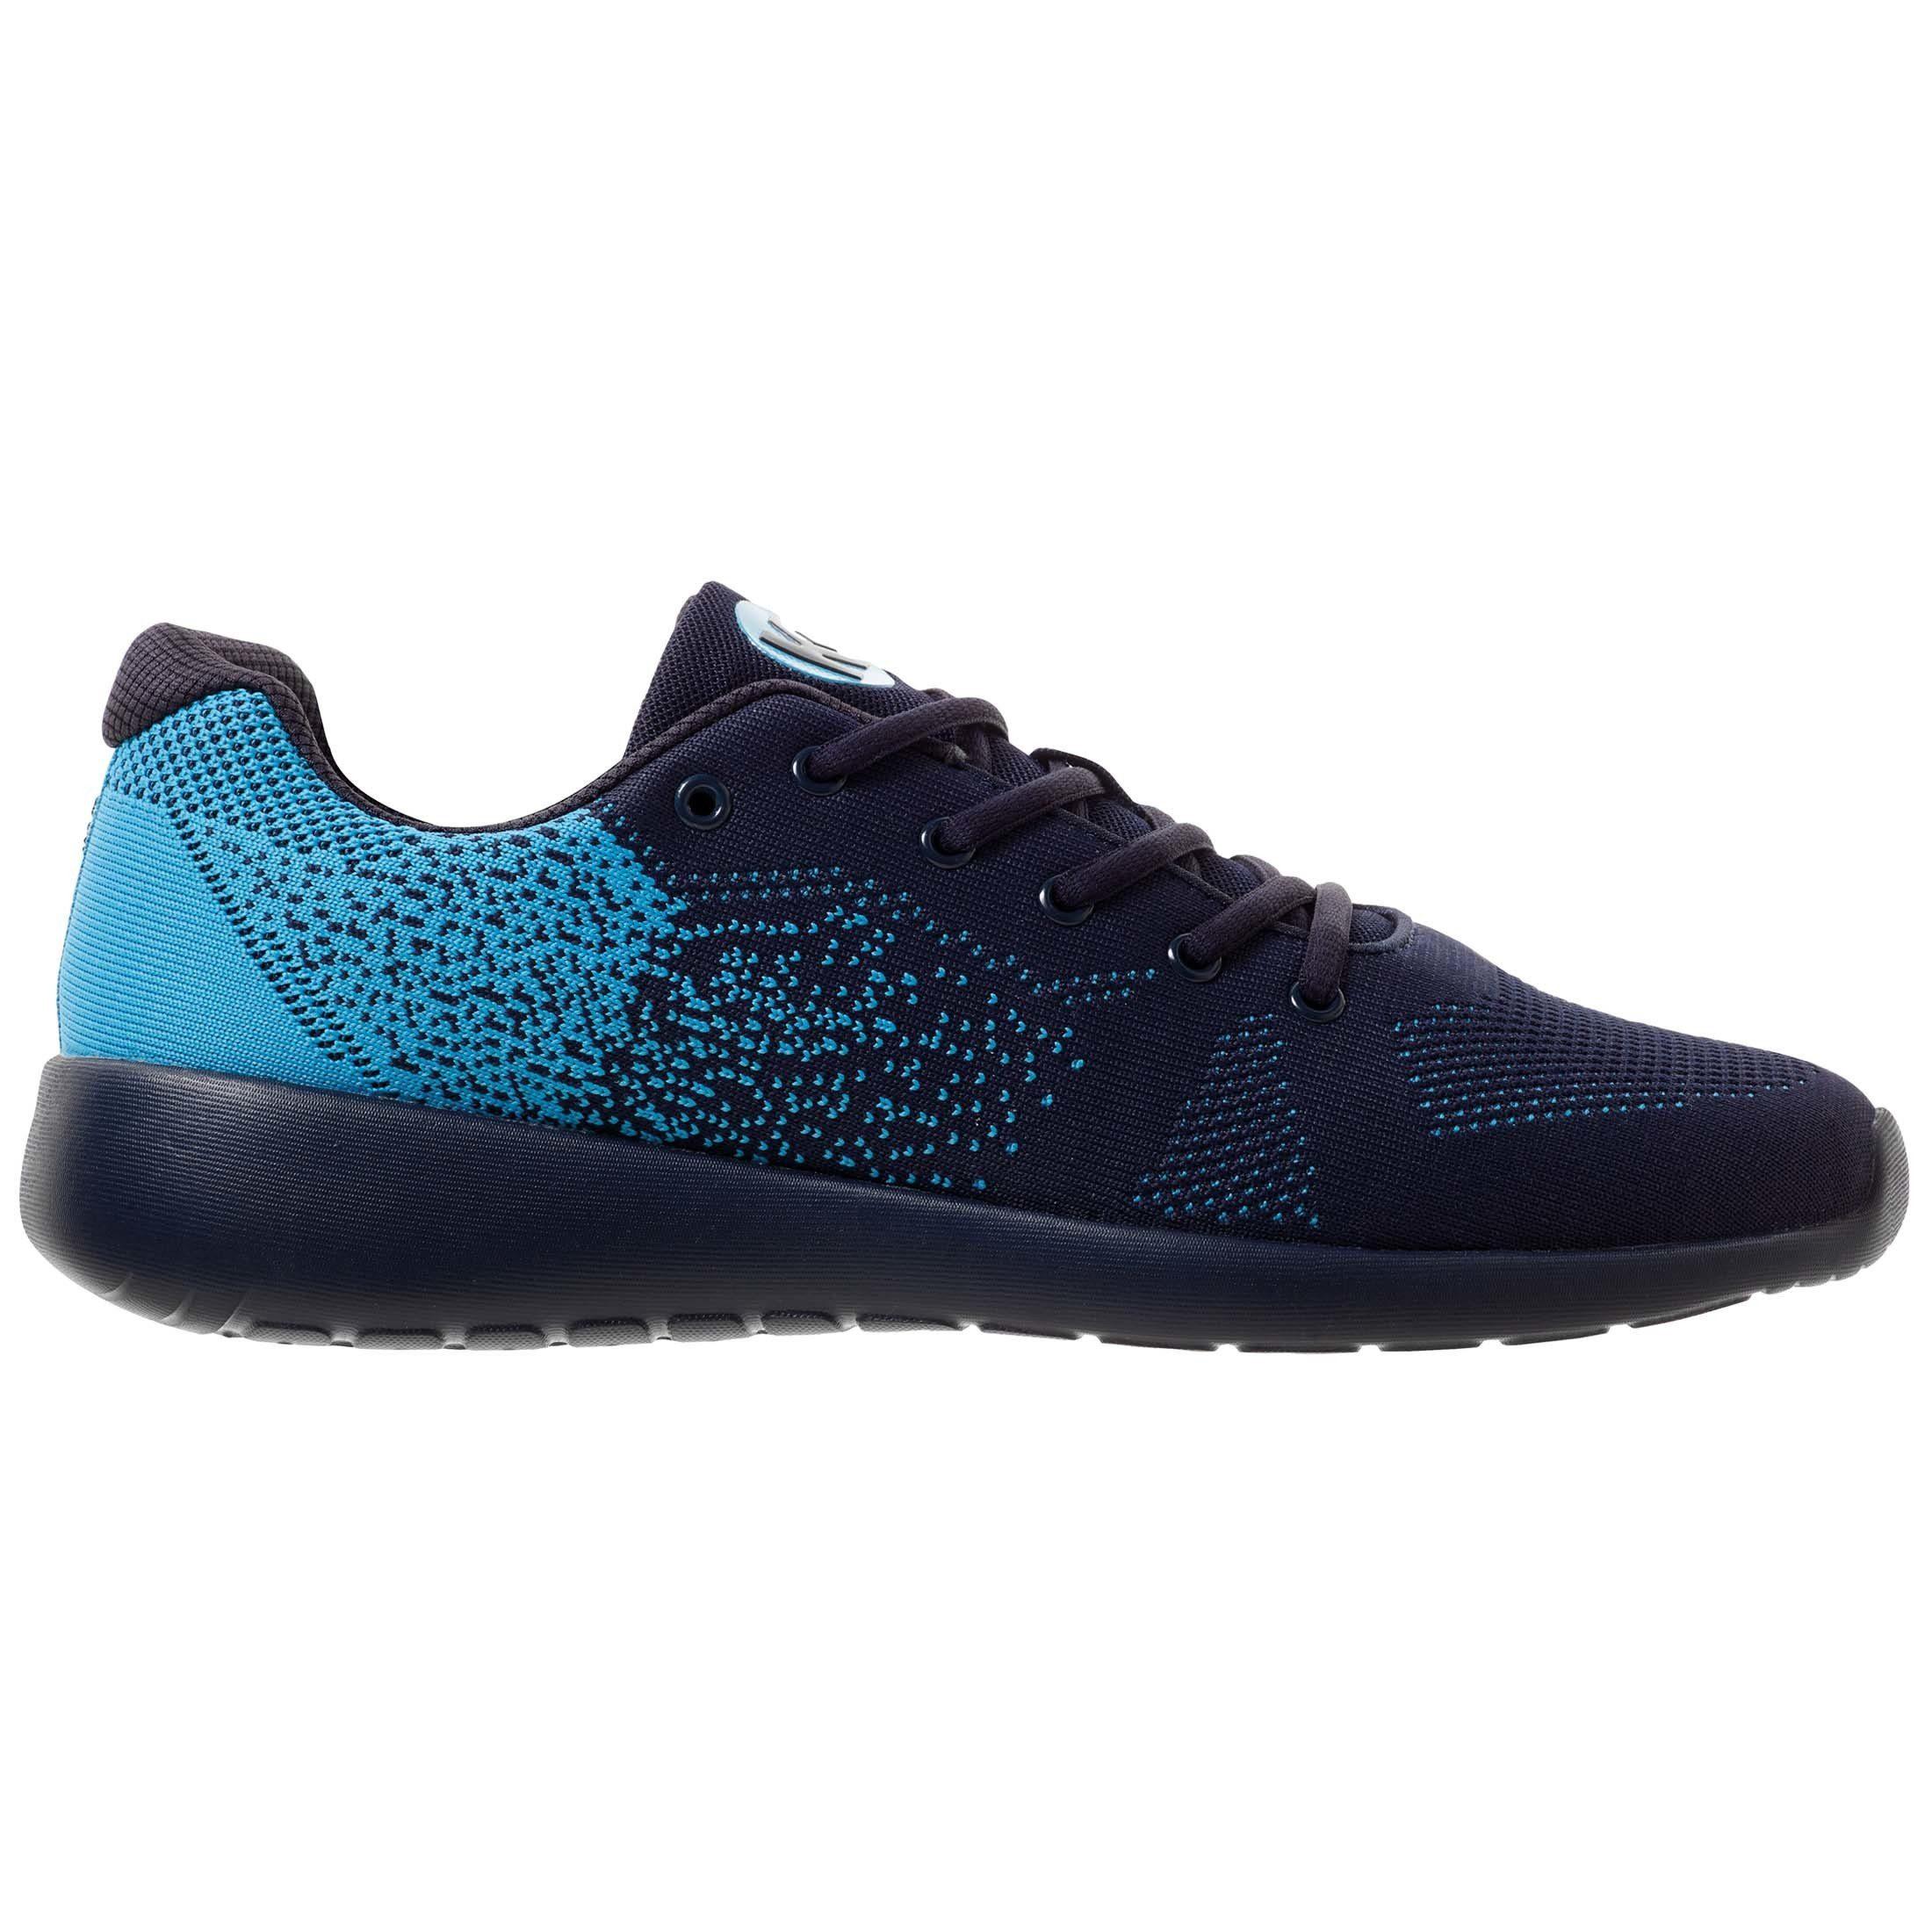 KEMPA K-Float Sneaker Herren online kaufen  marine #ft5_slash# kempablau